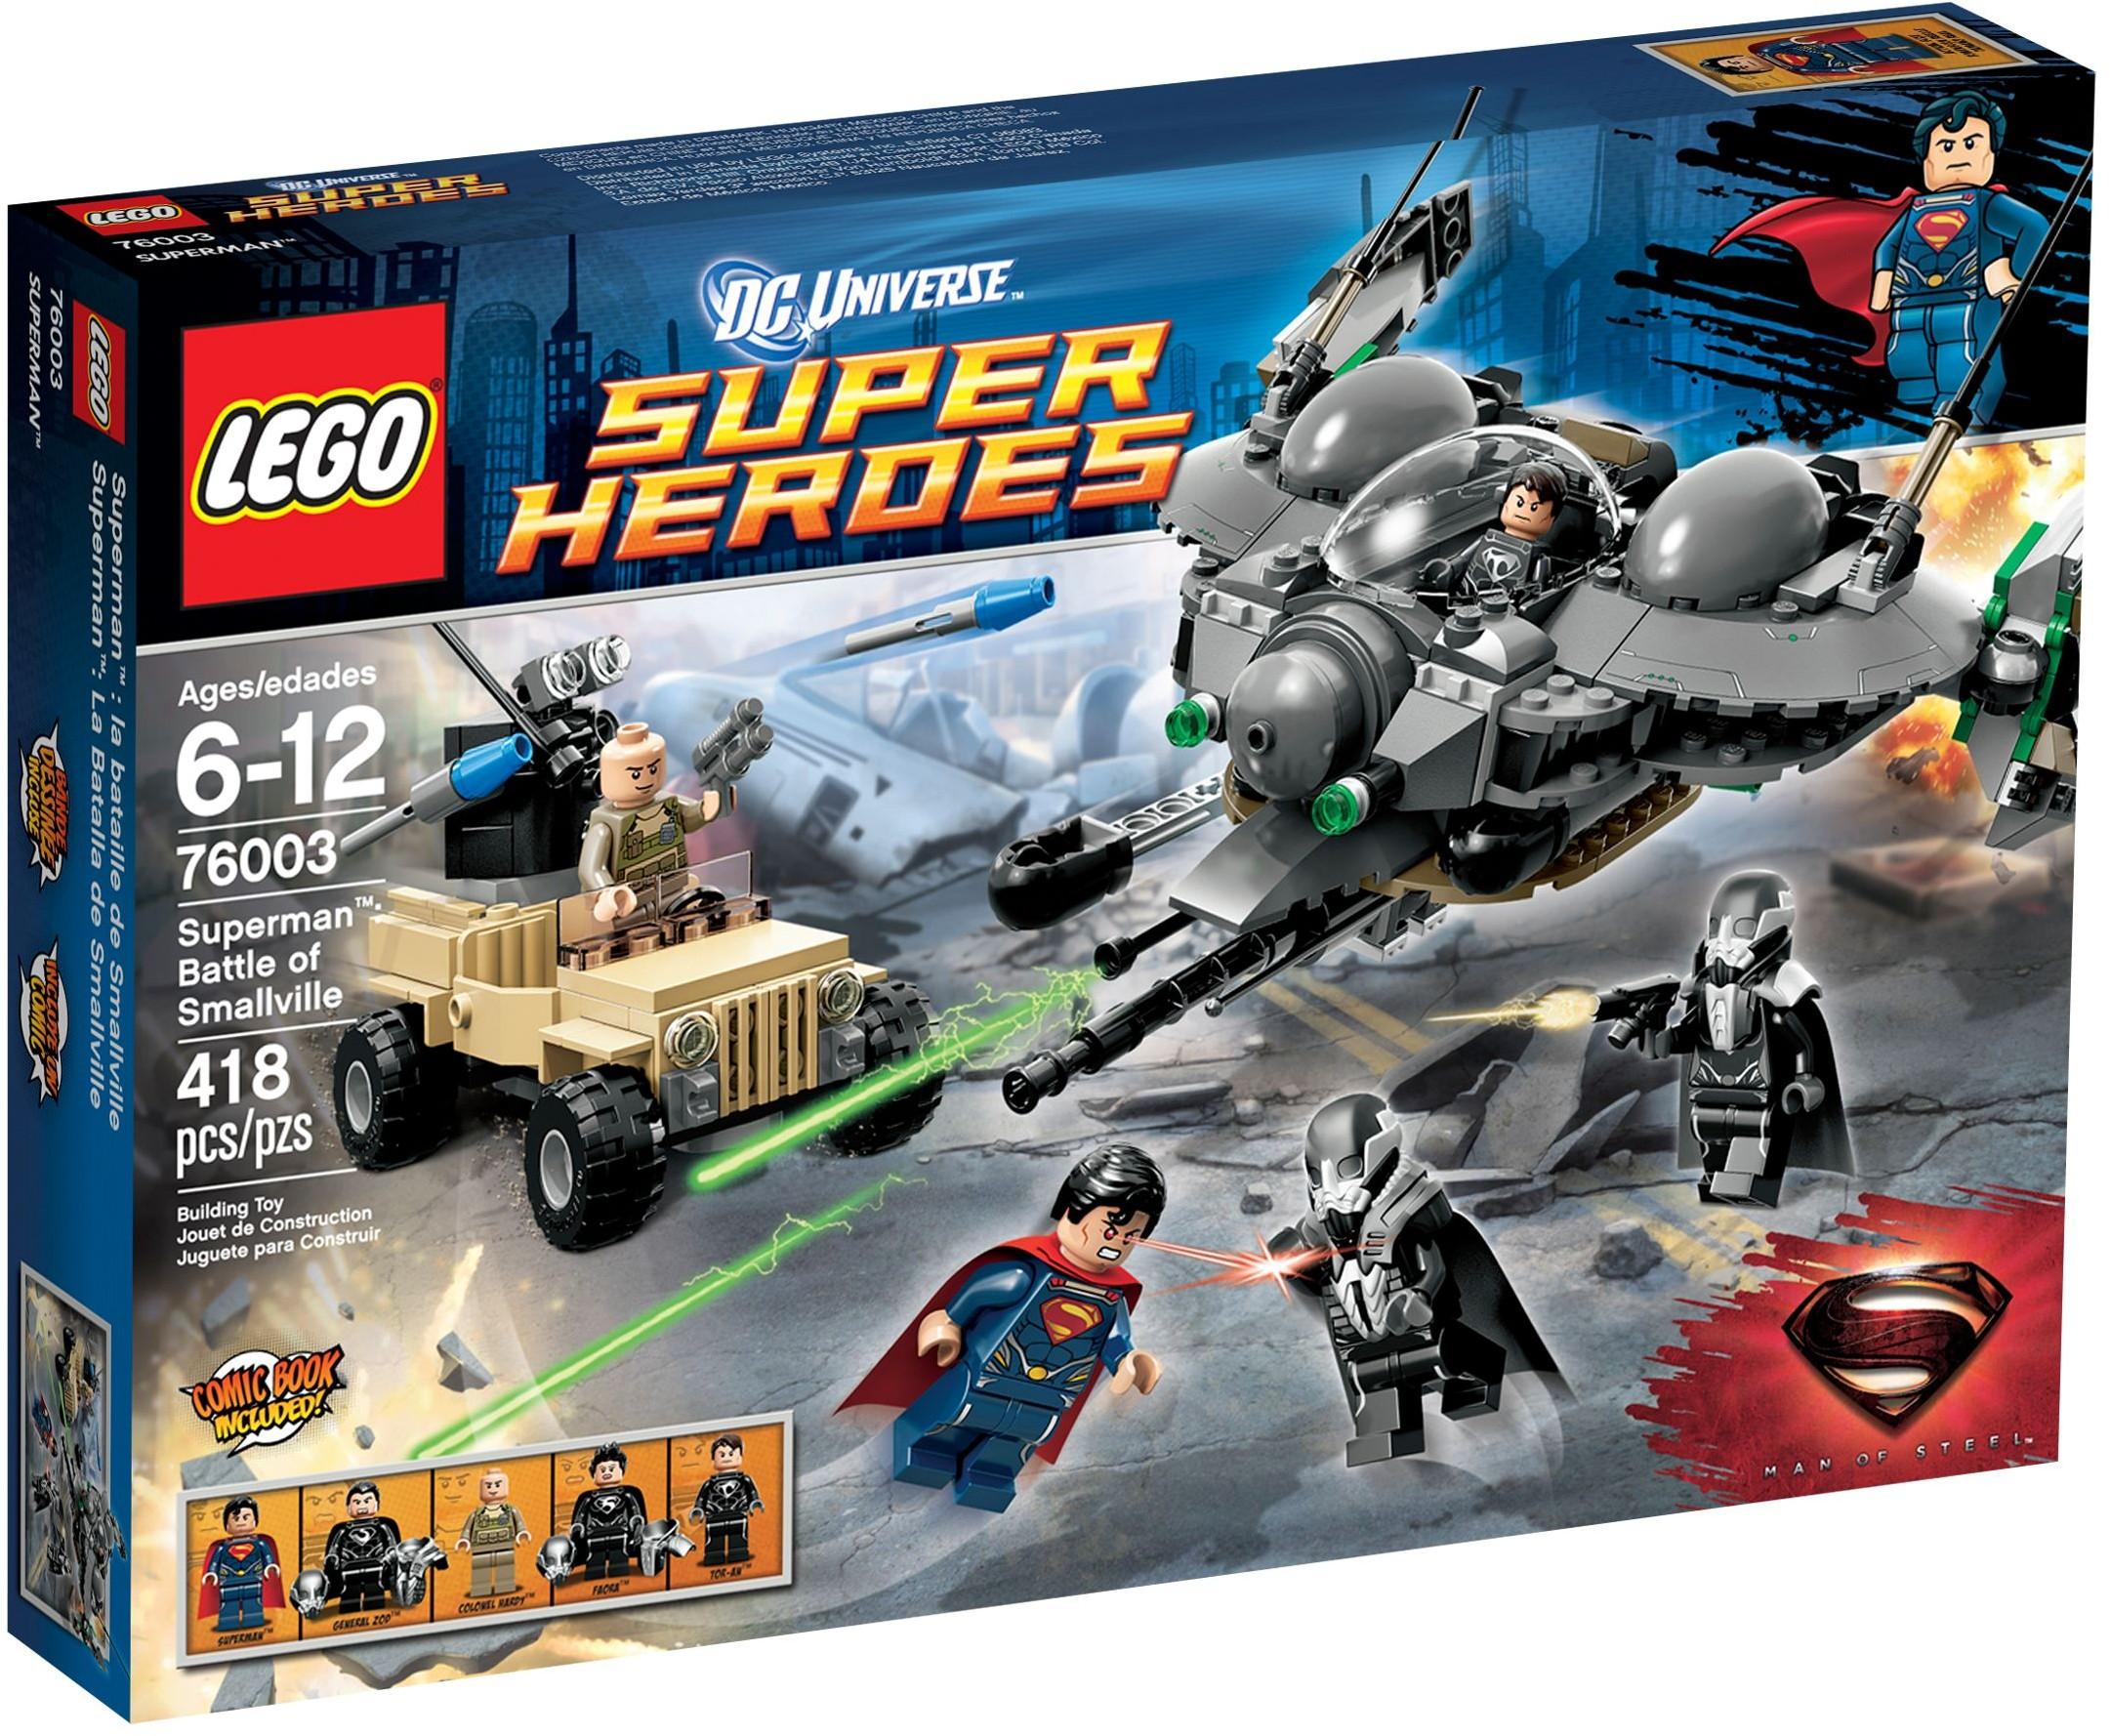 Lego Heroes 76003 Super Comics Bataille Dc De Smallville SupermanLa UzVpqSM